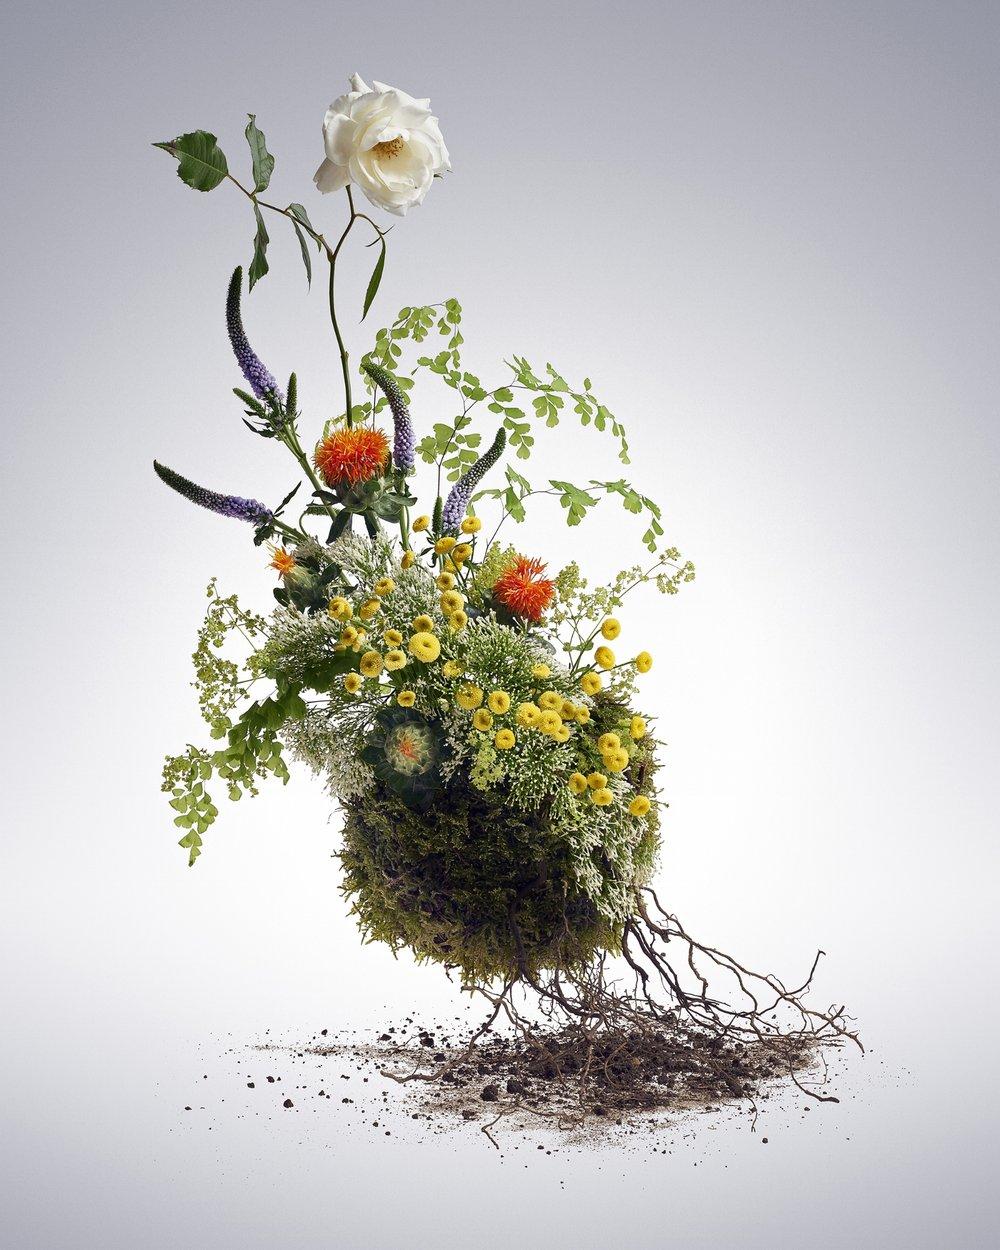 20150615_Flowers_Shot_1_Main_V4.jpg